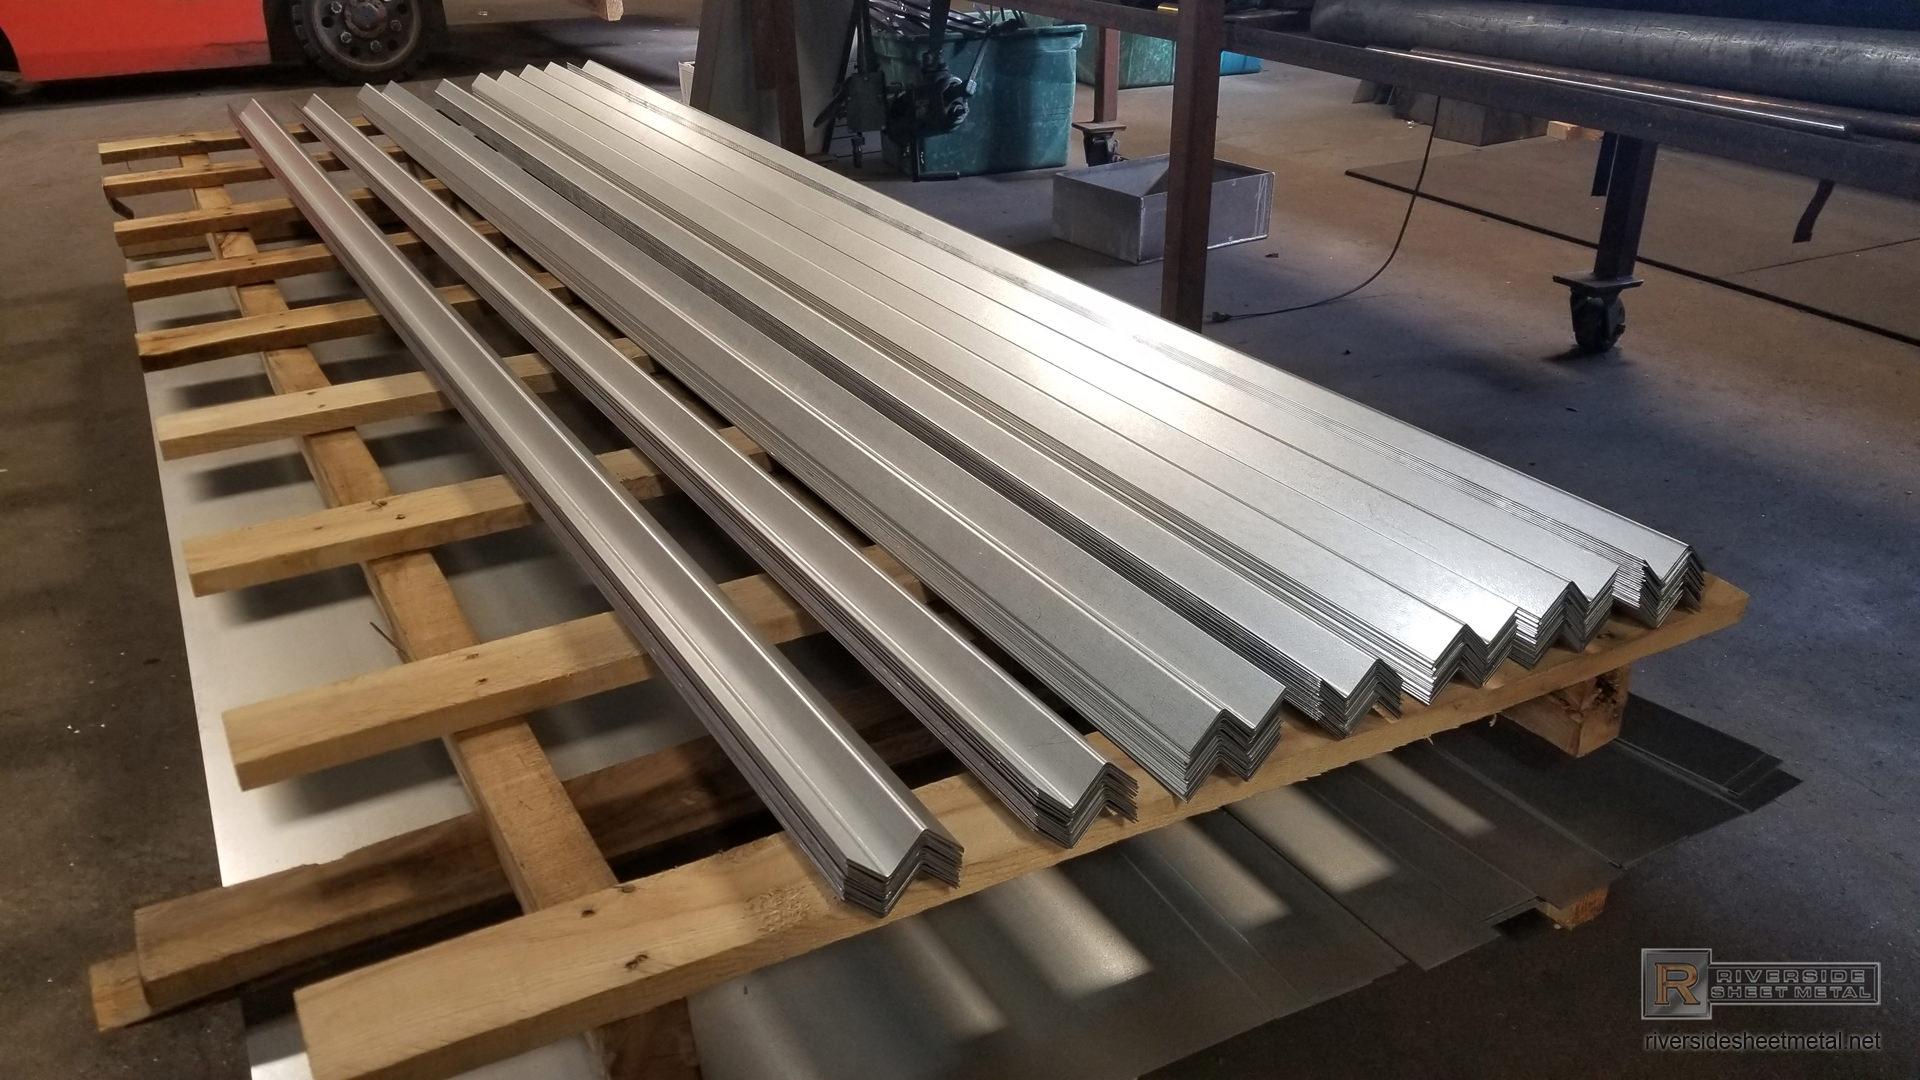 Galvanized Steel Galvi Sheet Metal 11 14 16 18 20 And 24 Gauge